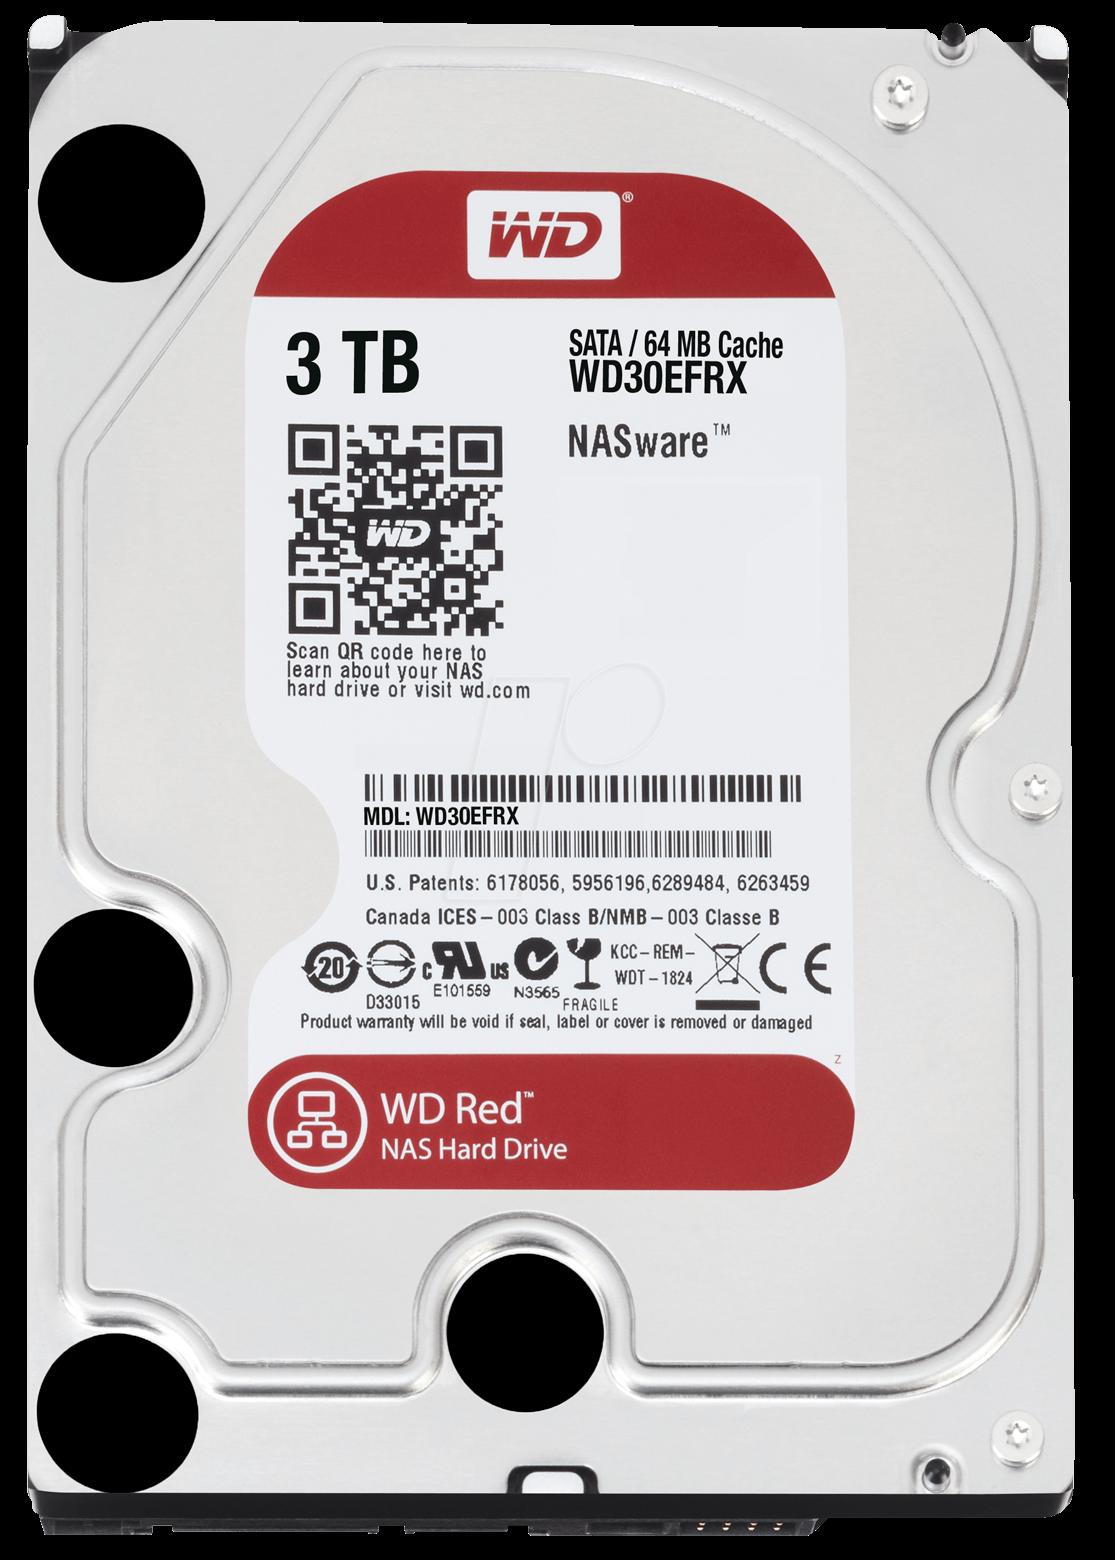 WESTERN DIGITAL WD30EFRX-OEM - WD Red 3,5-Zoll-NAS-Festplatte mit 3 TB, OEM WD30EFRX OEM